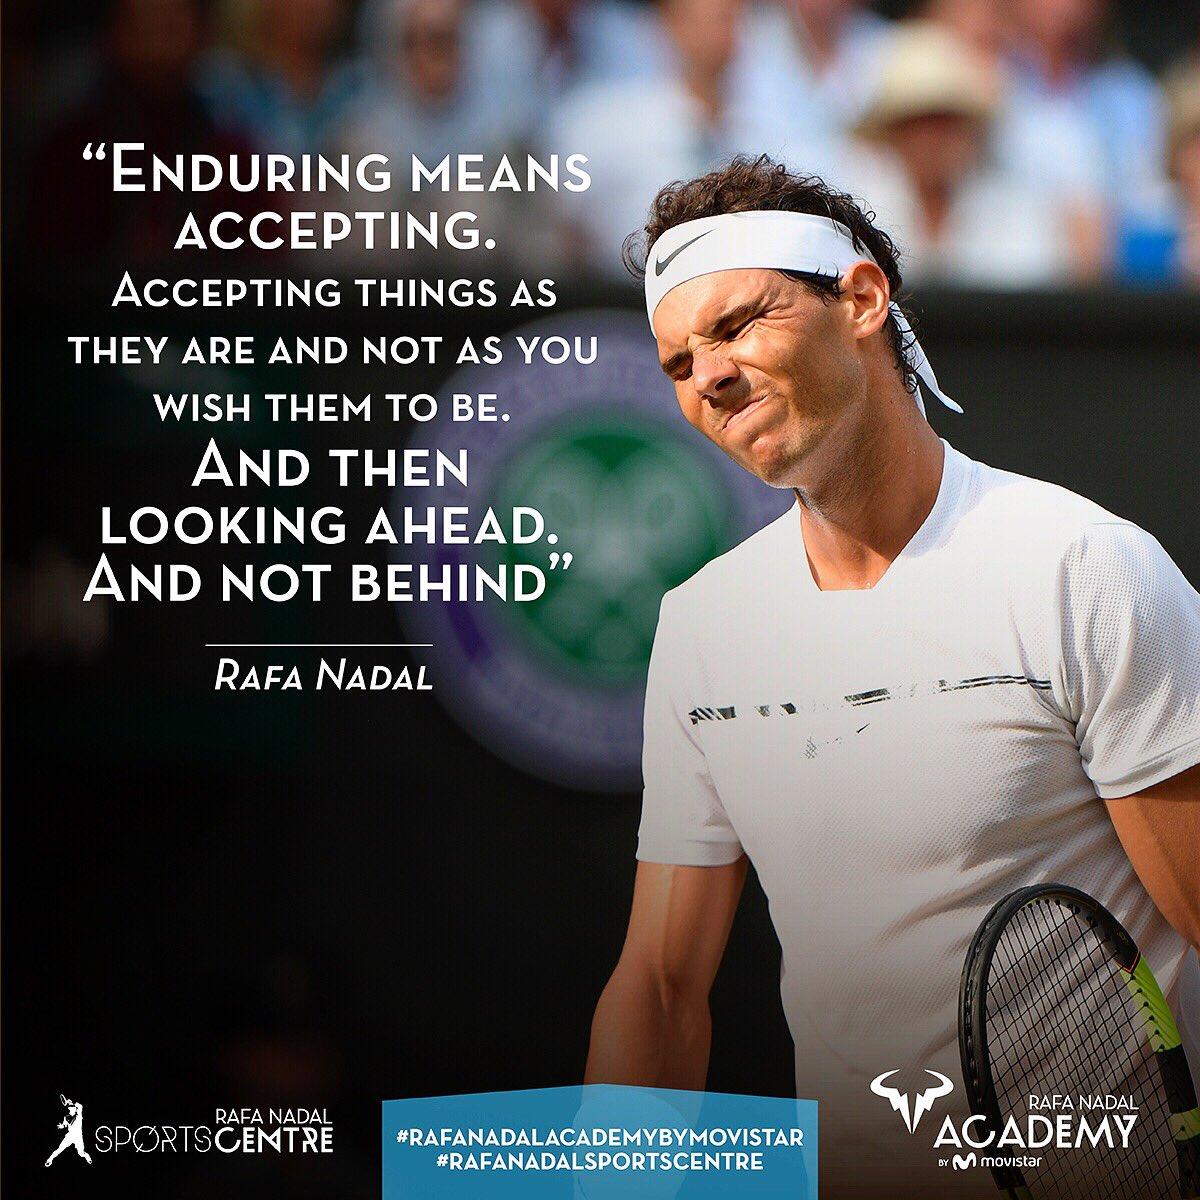 Rafa Nadal Academy By Movistar On Twitter Rafaelnadal Rafanadalacademy Values